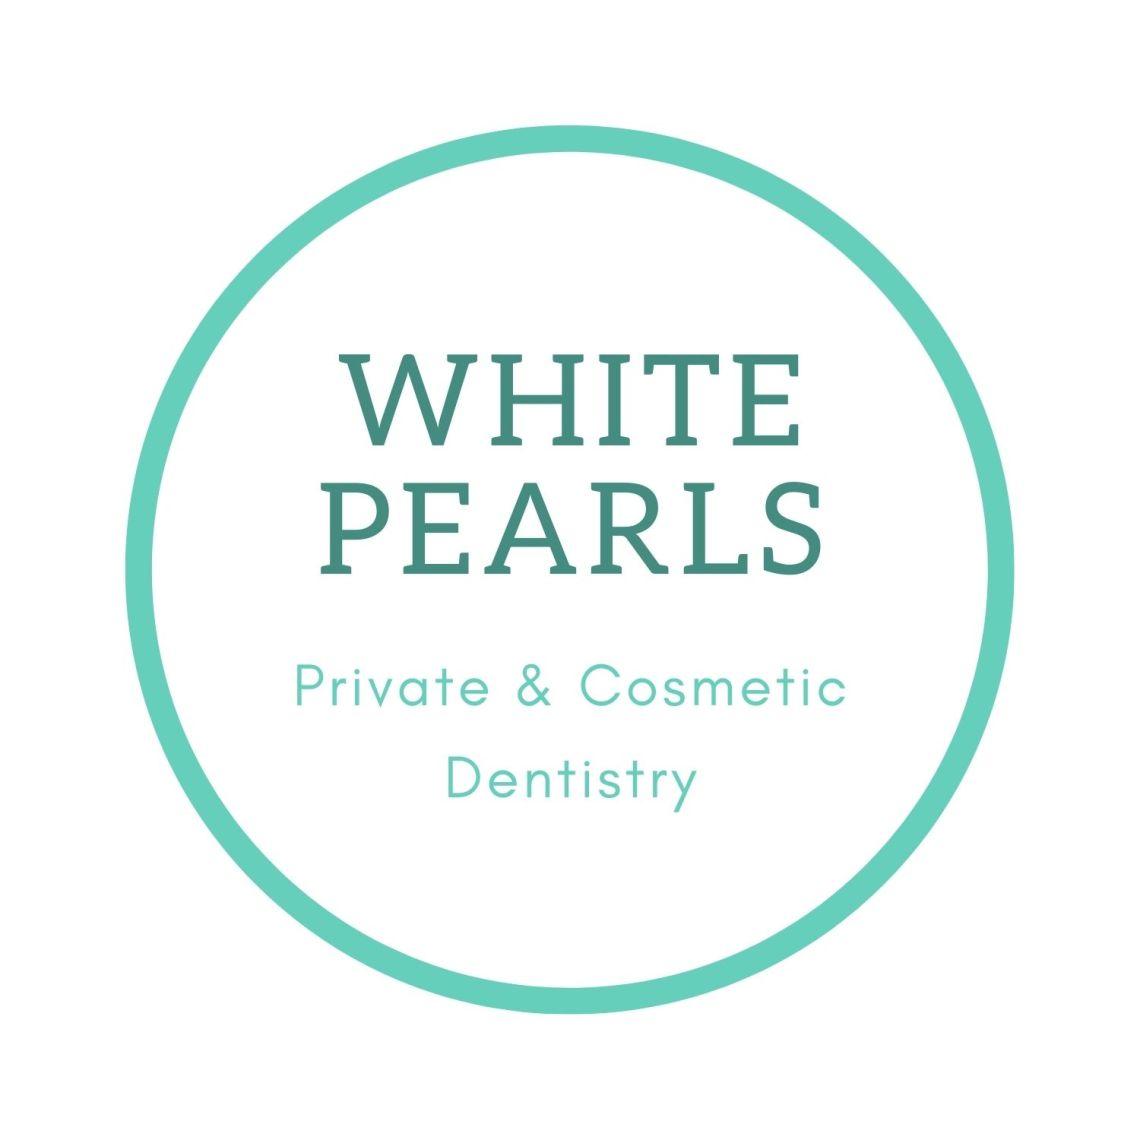 White-with-Round-Mint-Dental-Logo